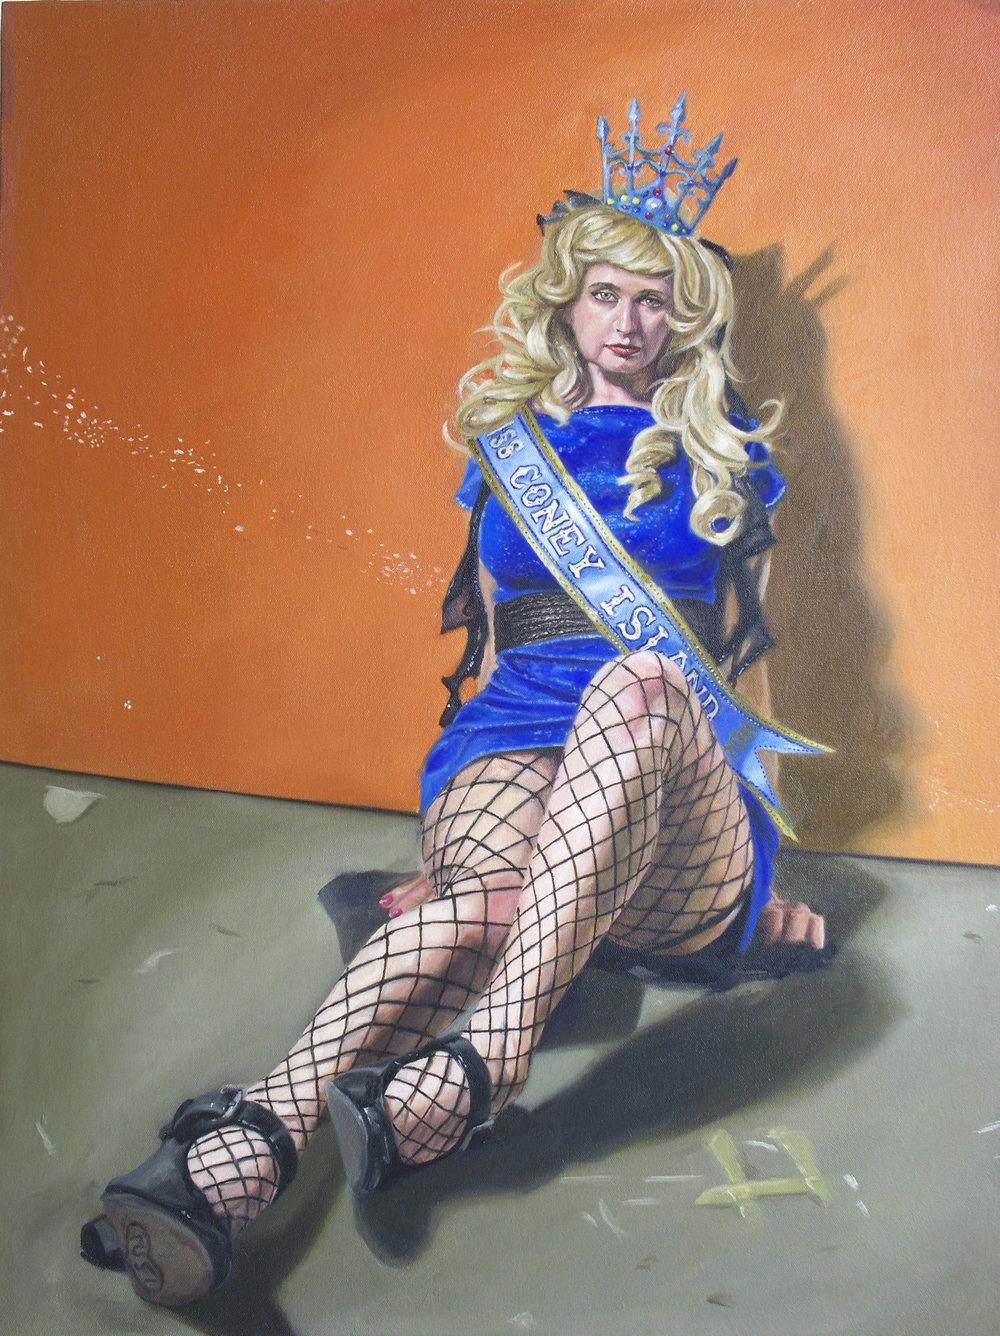 Miss Coney Island 2011: Orange